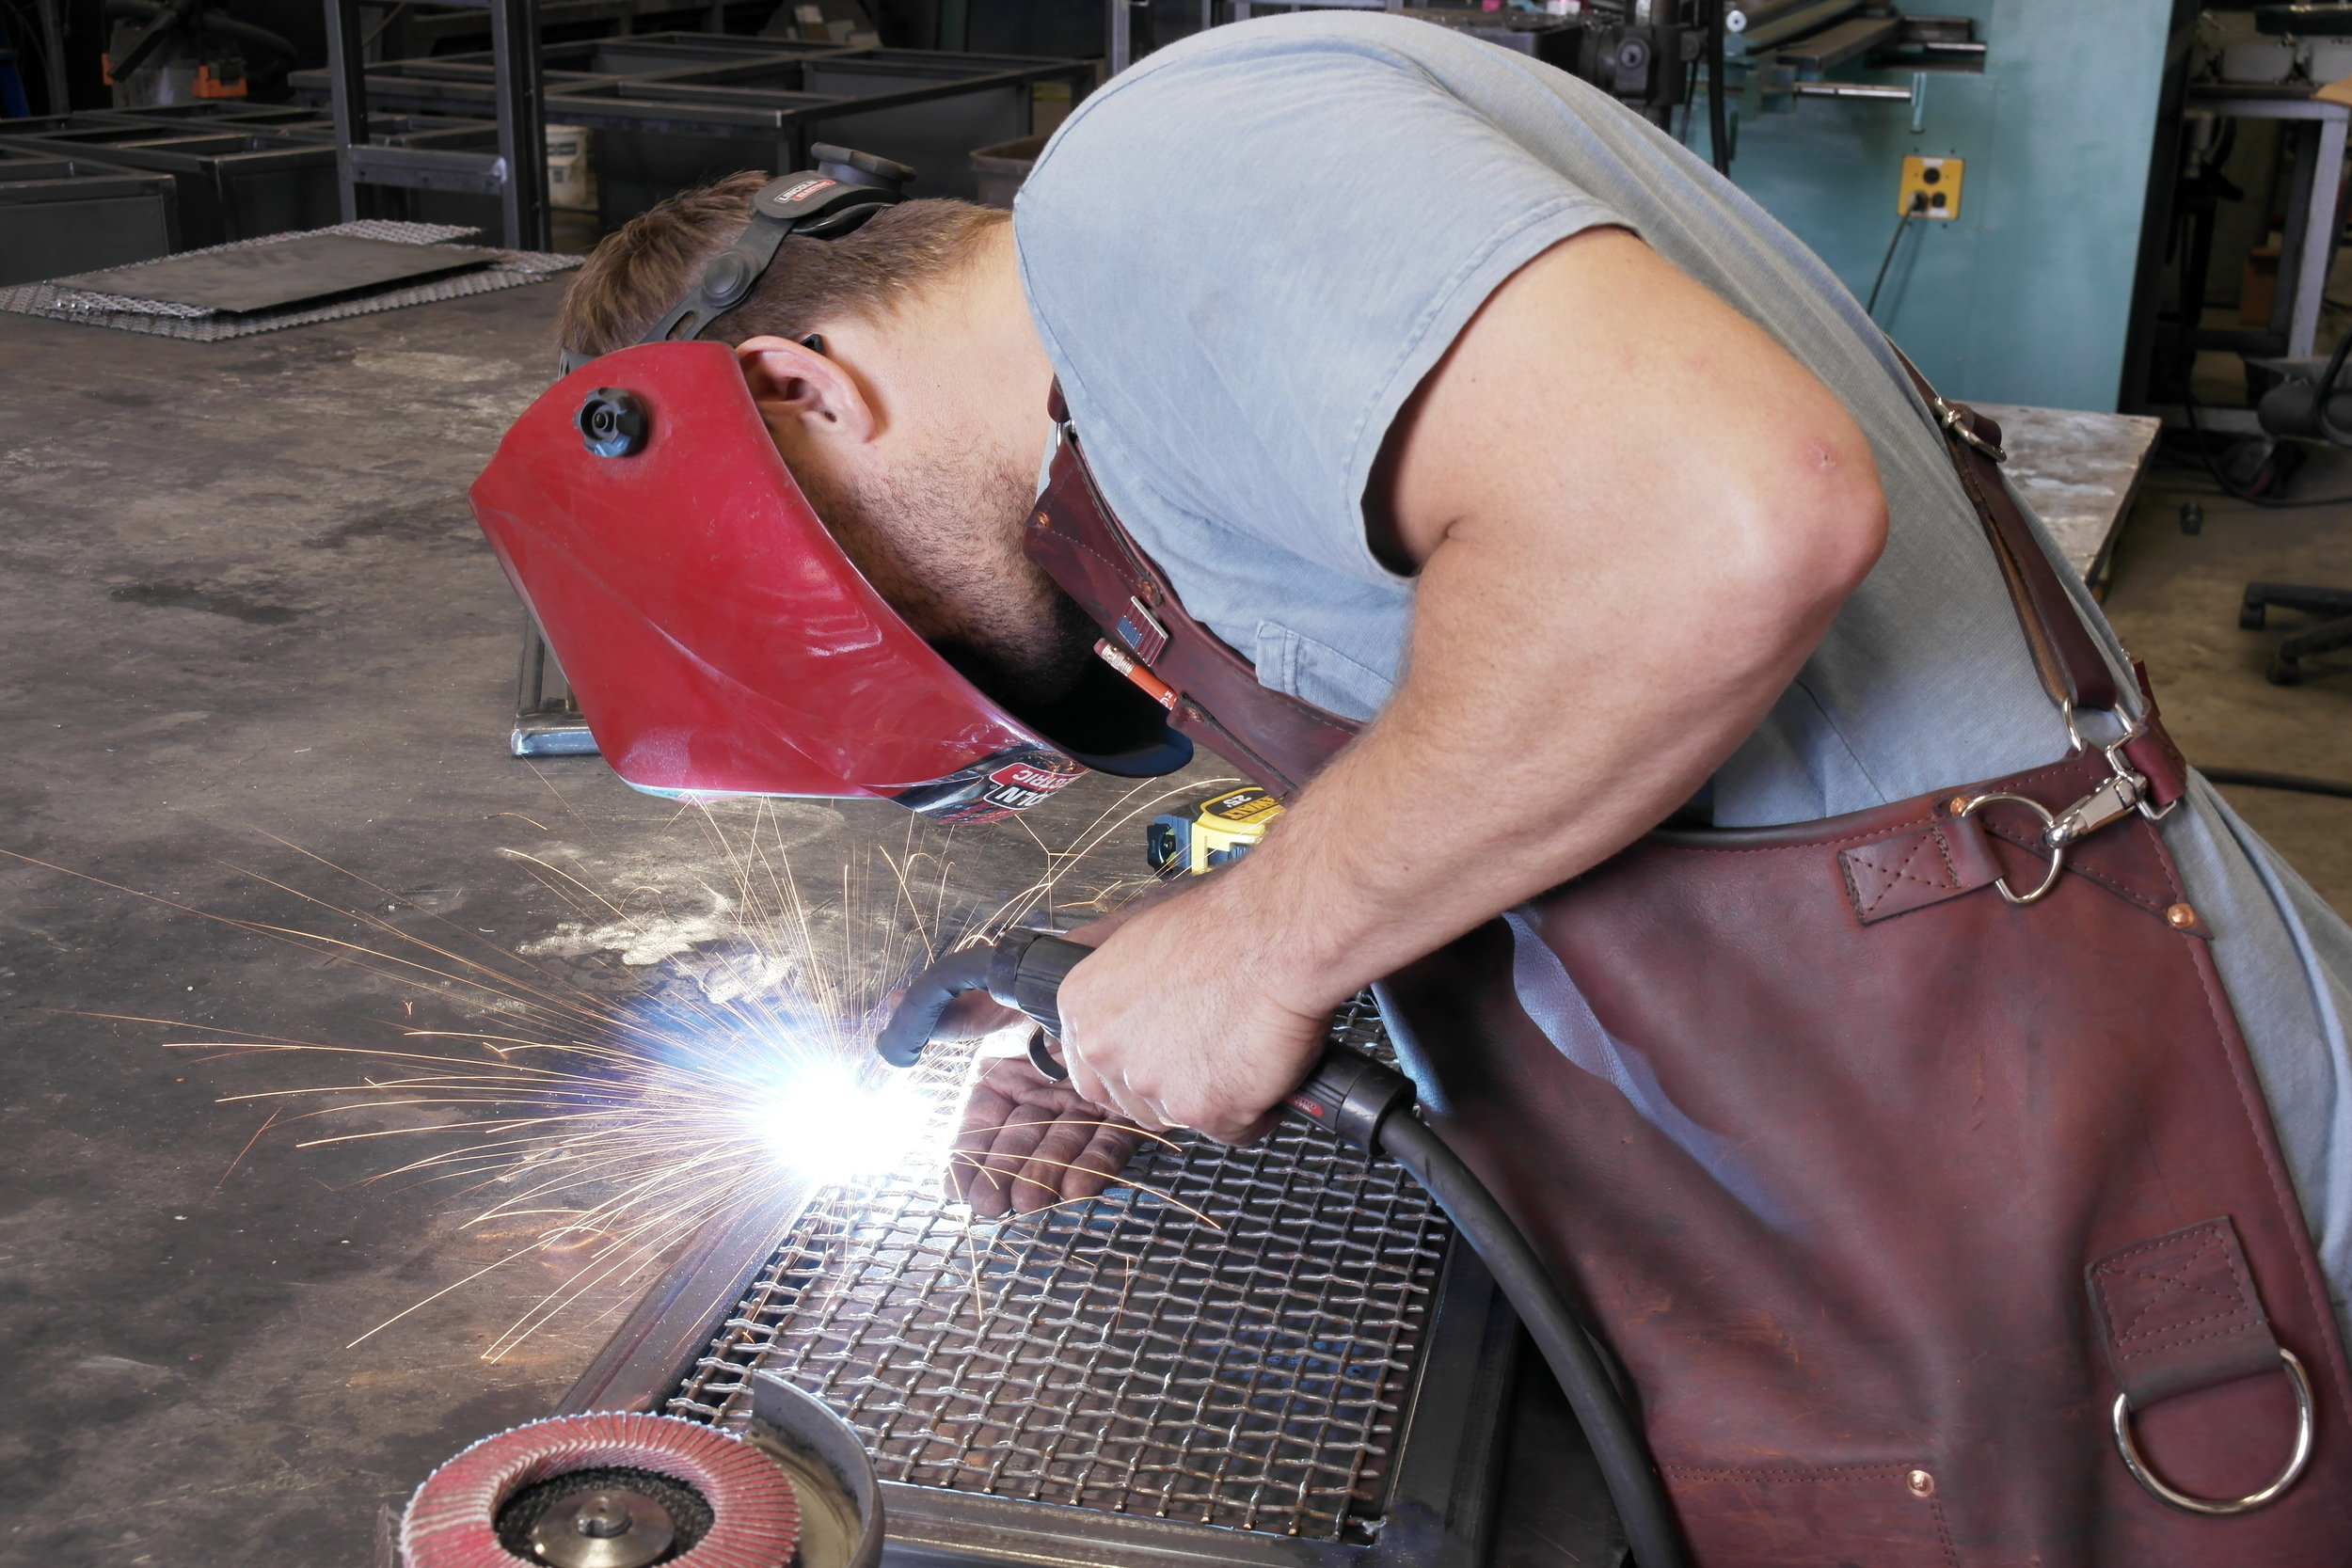 shop apron - work apron - leather apron - custom leather heavy weight apron - custom leather apron - custom leather shop apron - metal fabrication apron - welding apron